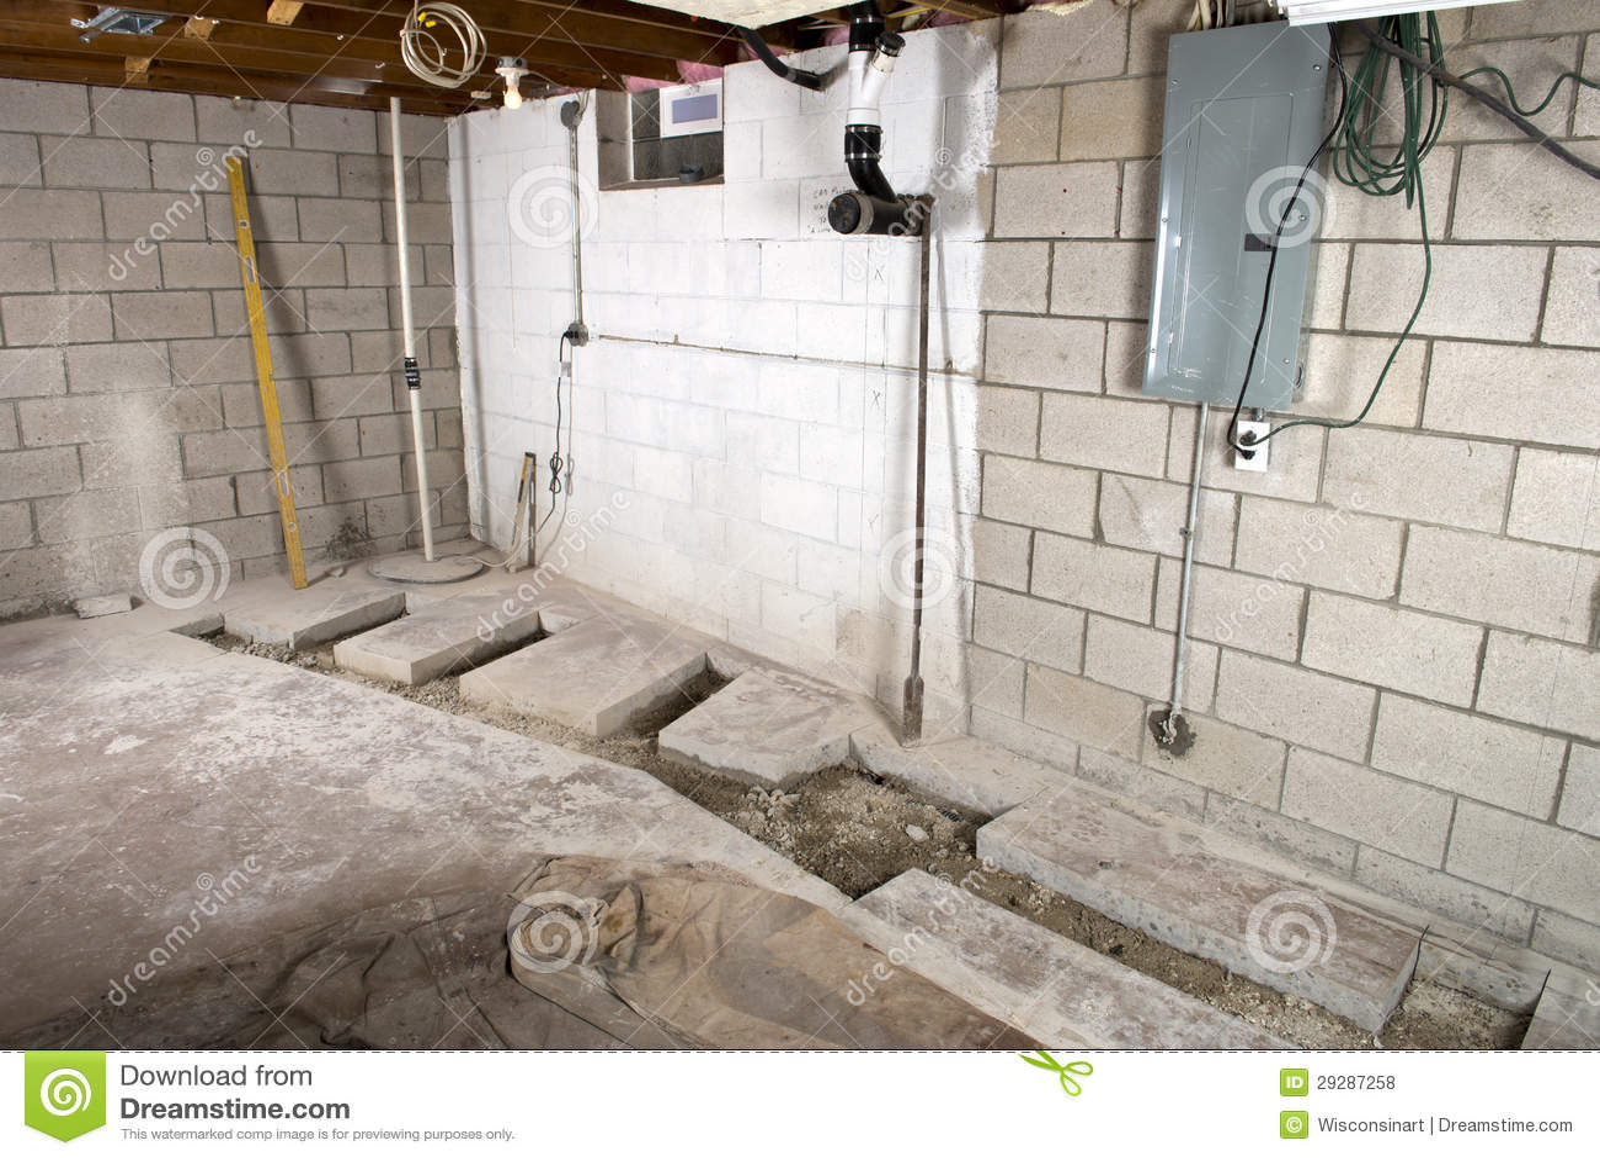 Home Improvement Basement Remodeling, Plumbing Royalty ...